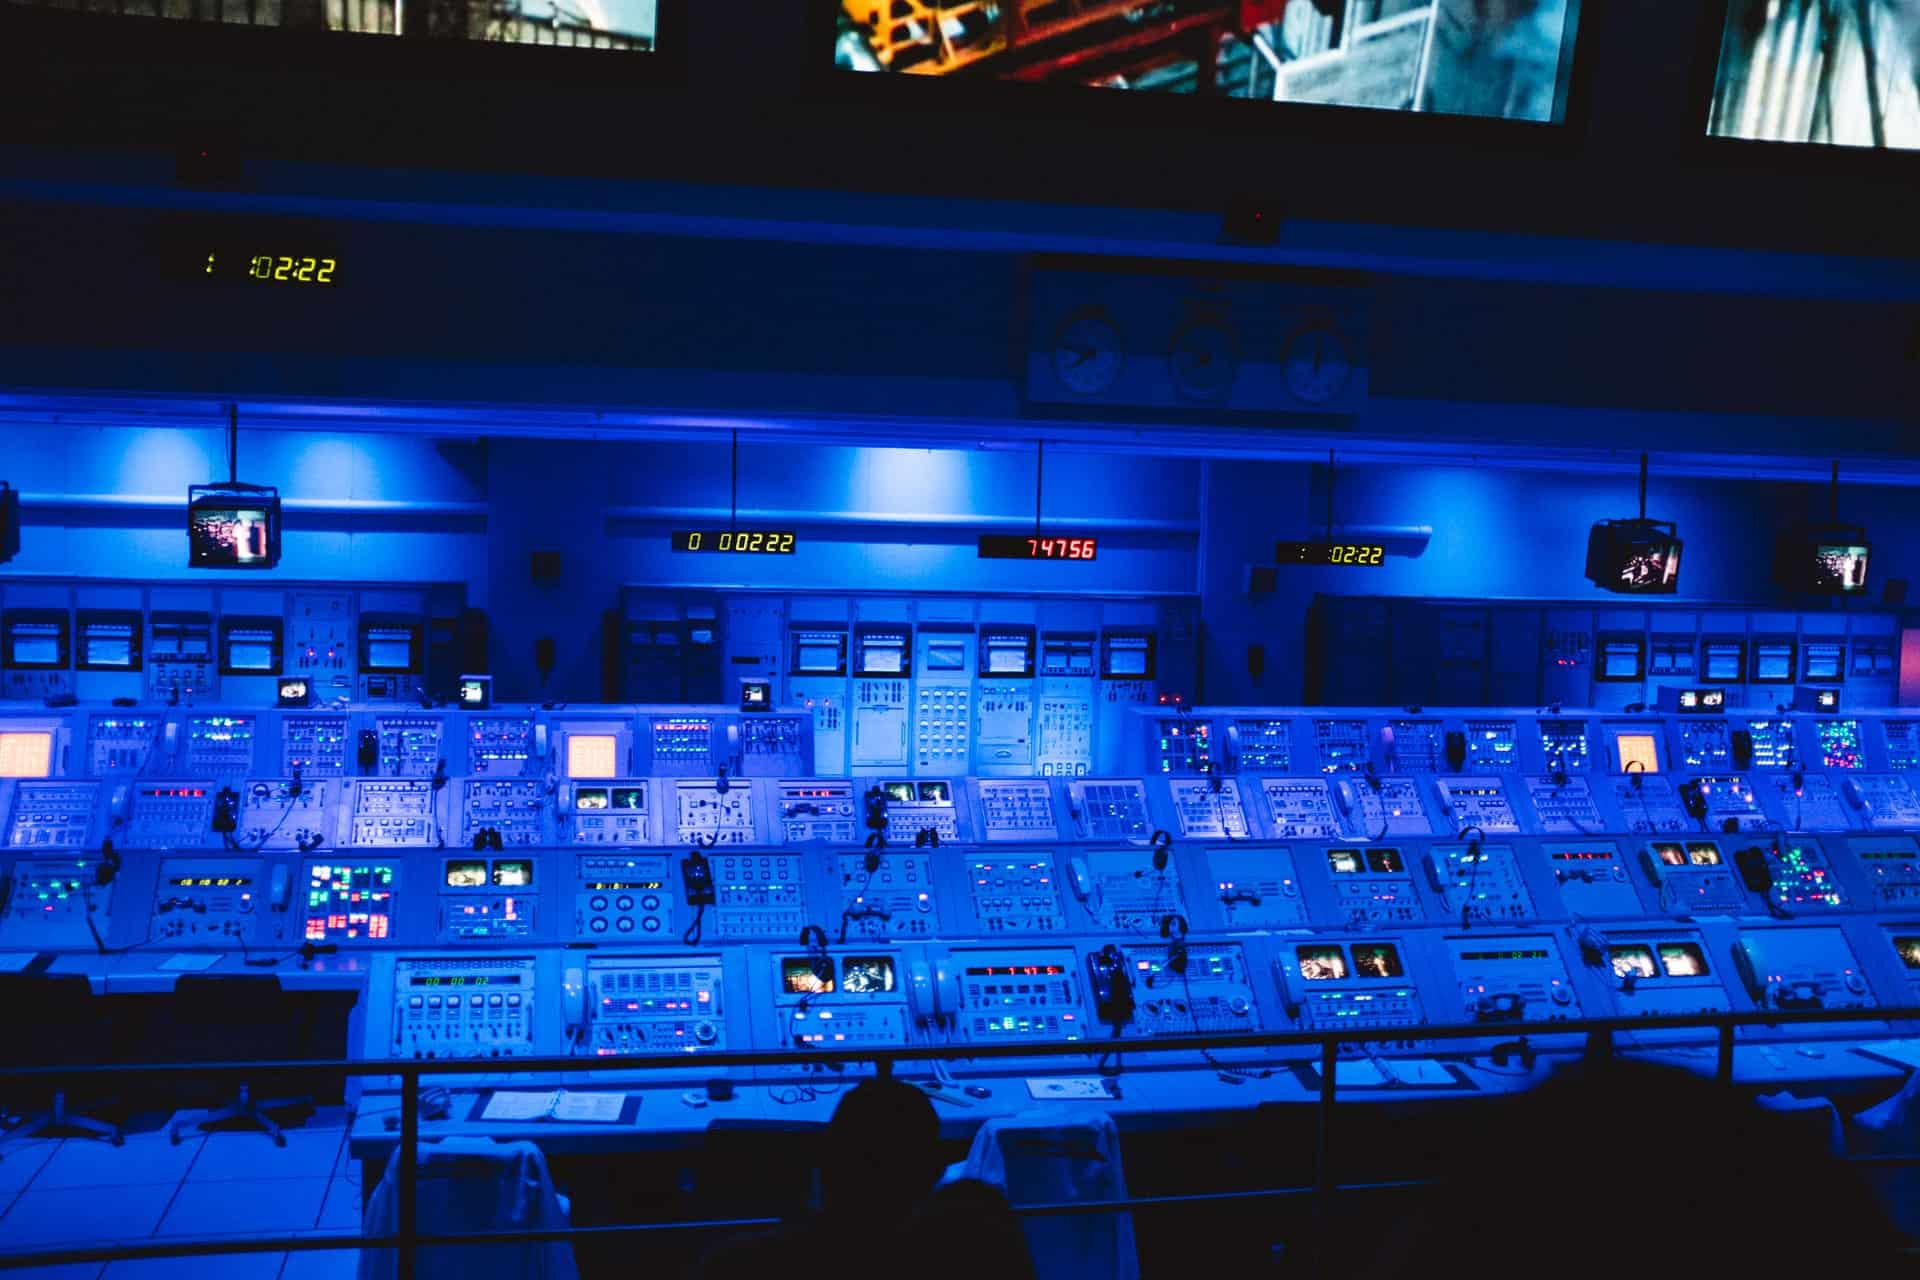 NASA control panel